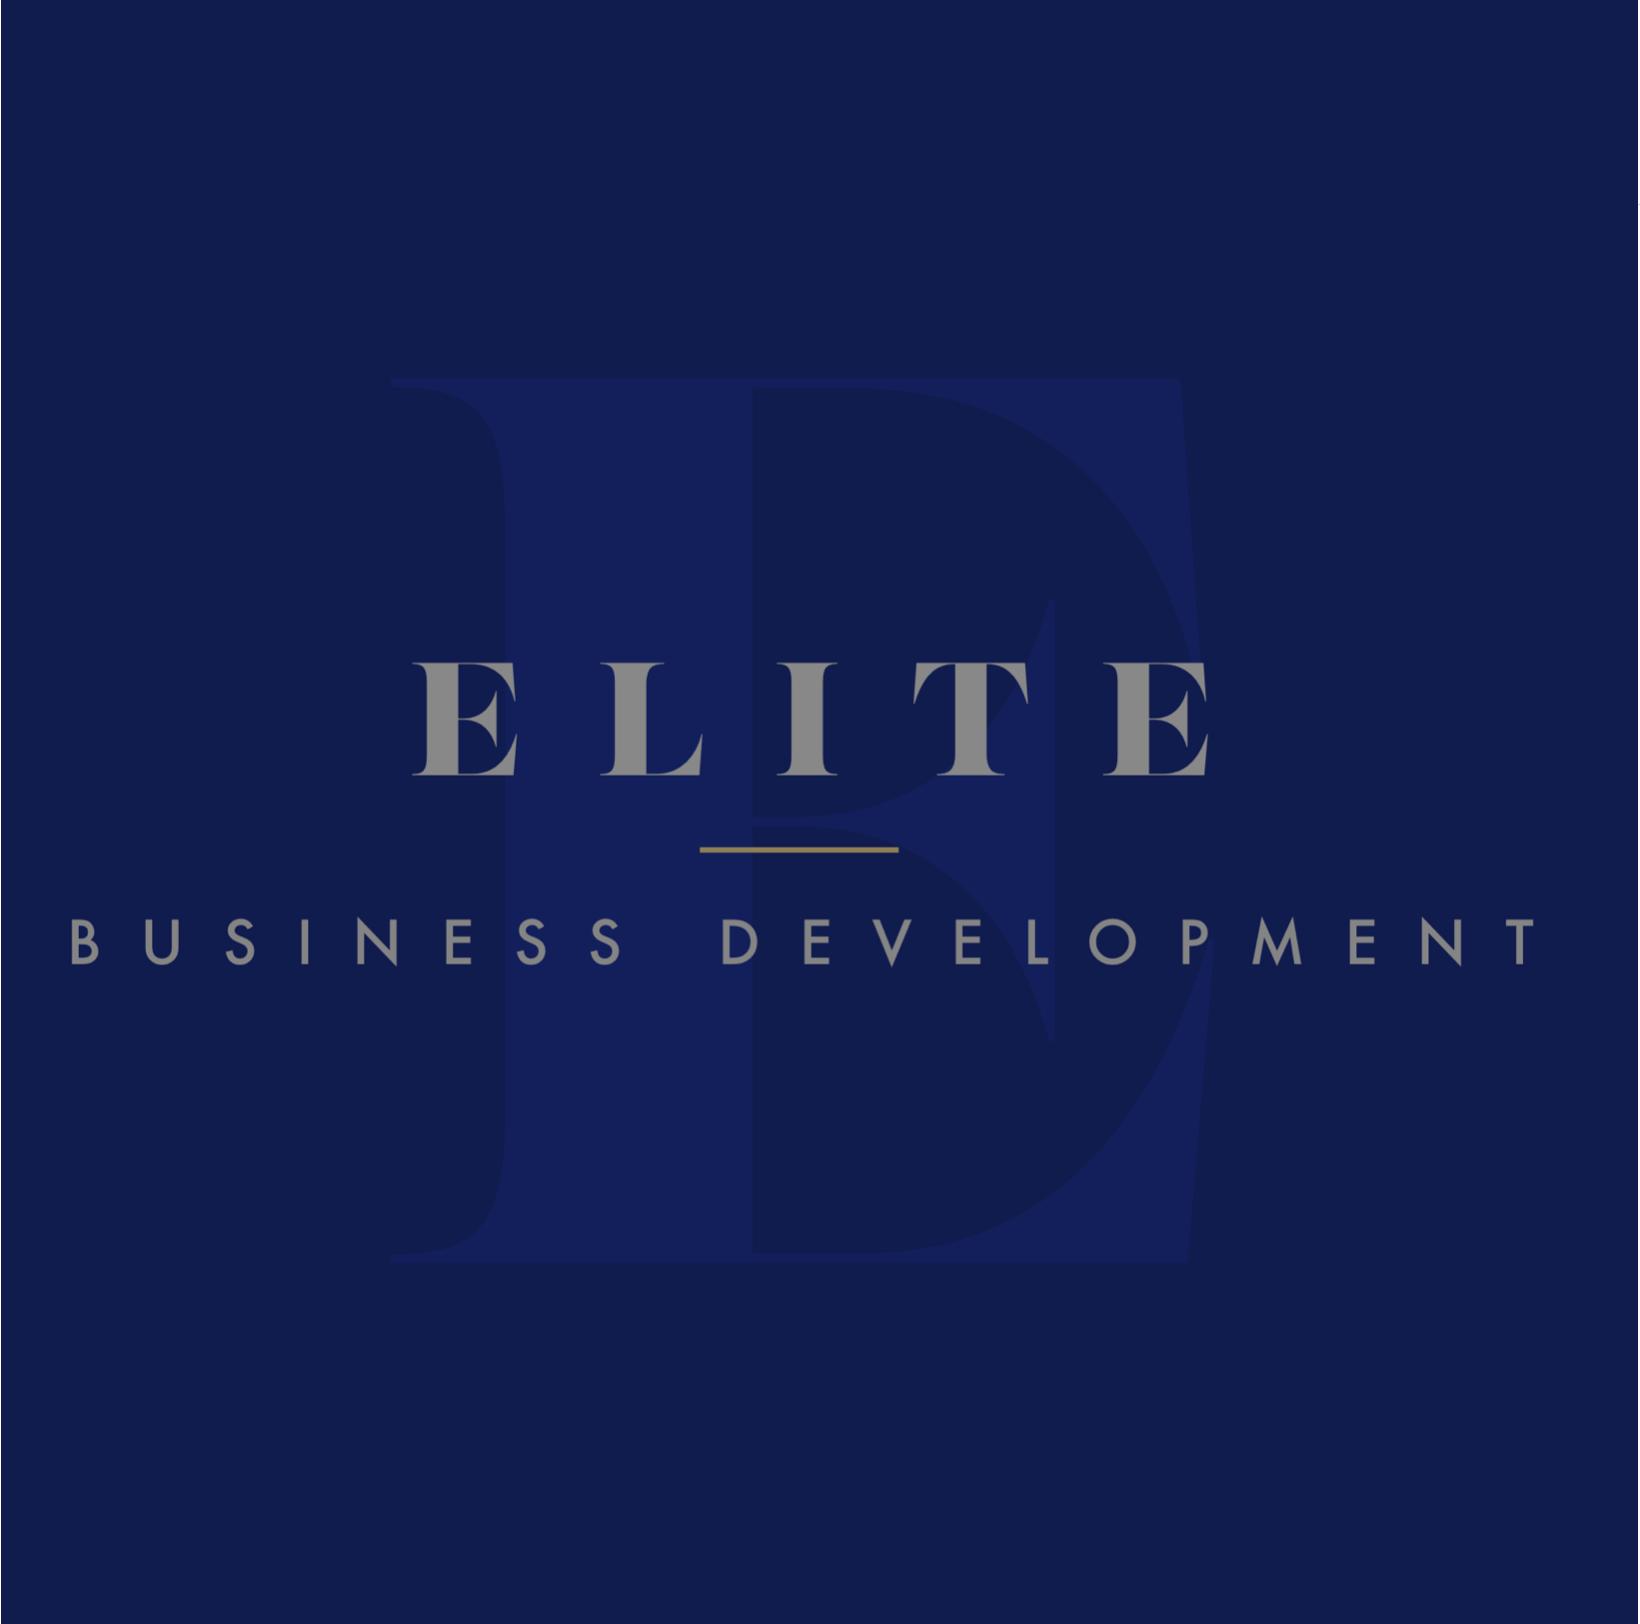 Elite business development